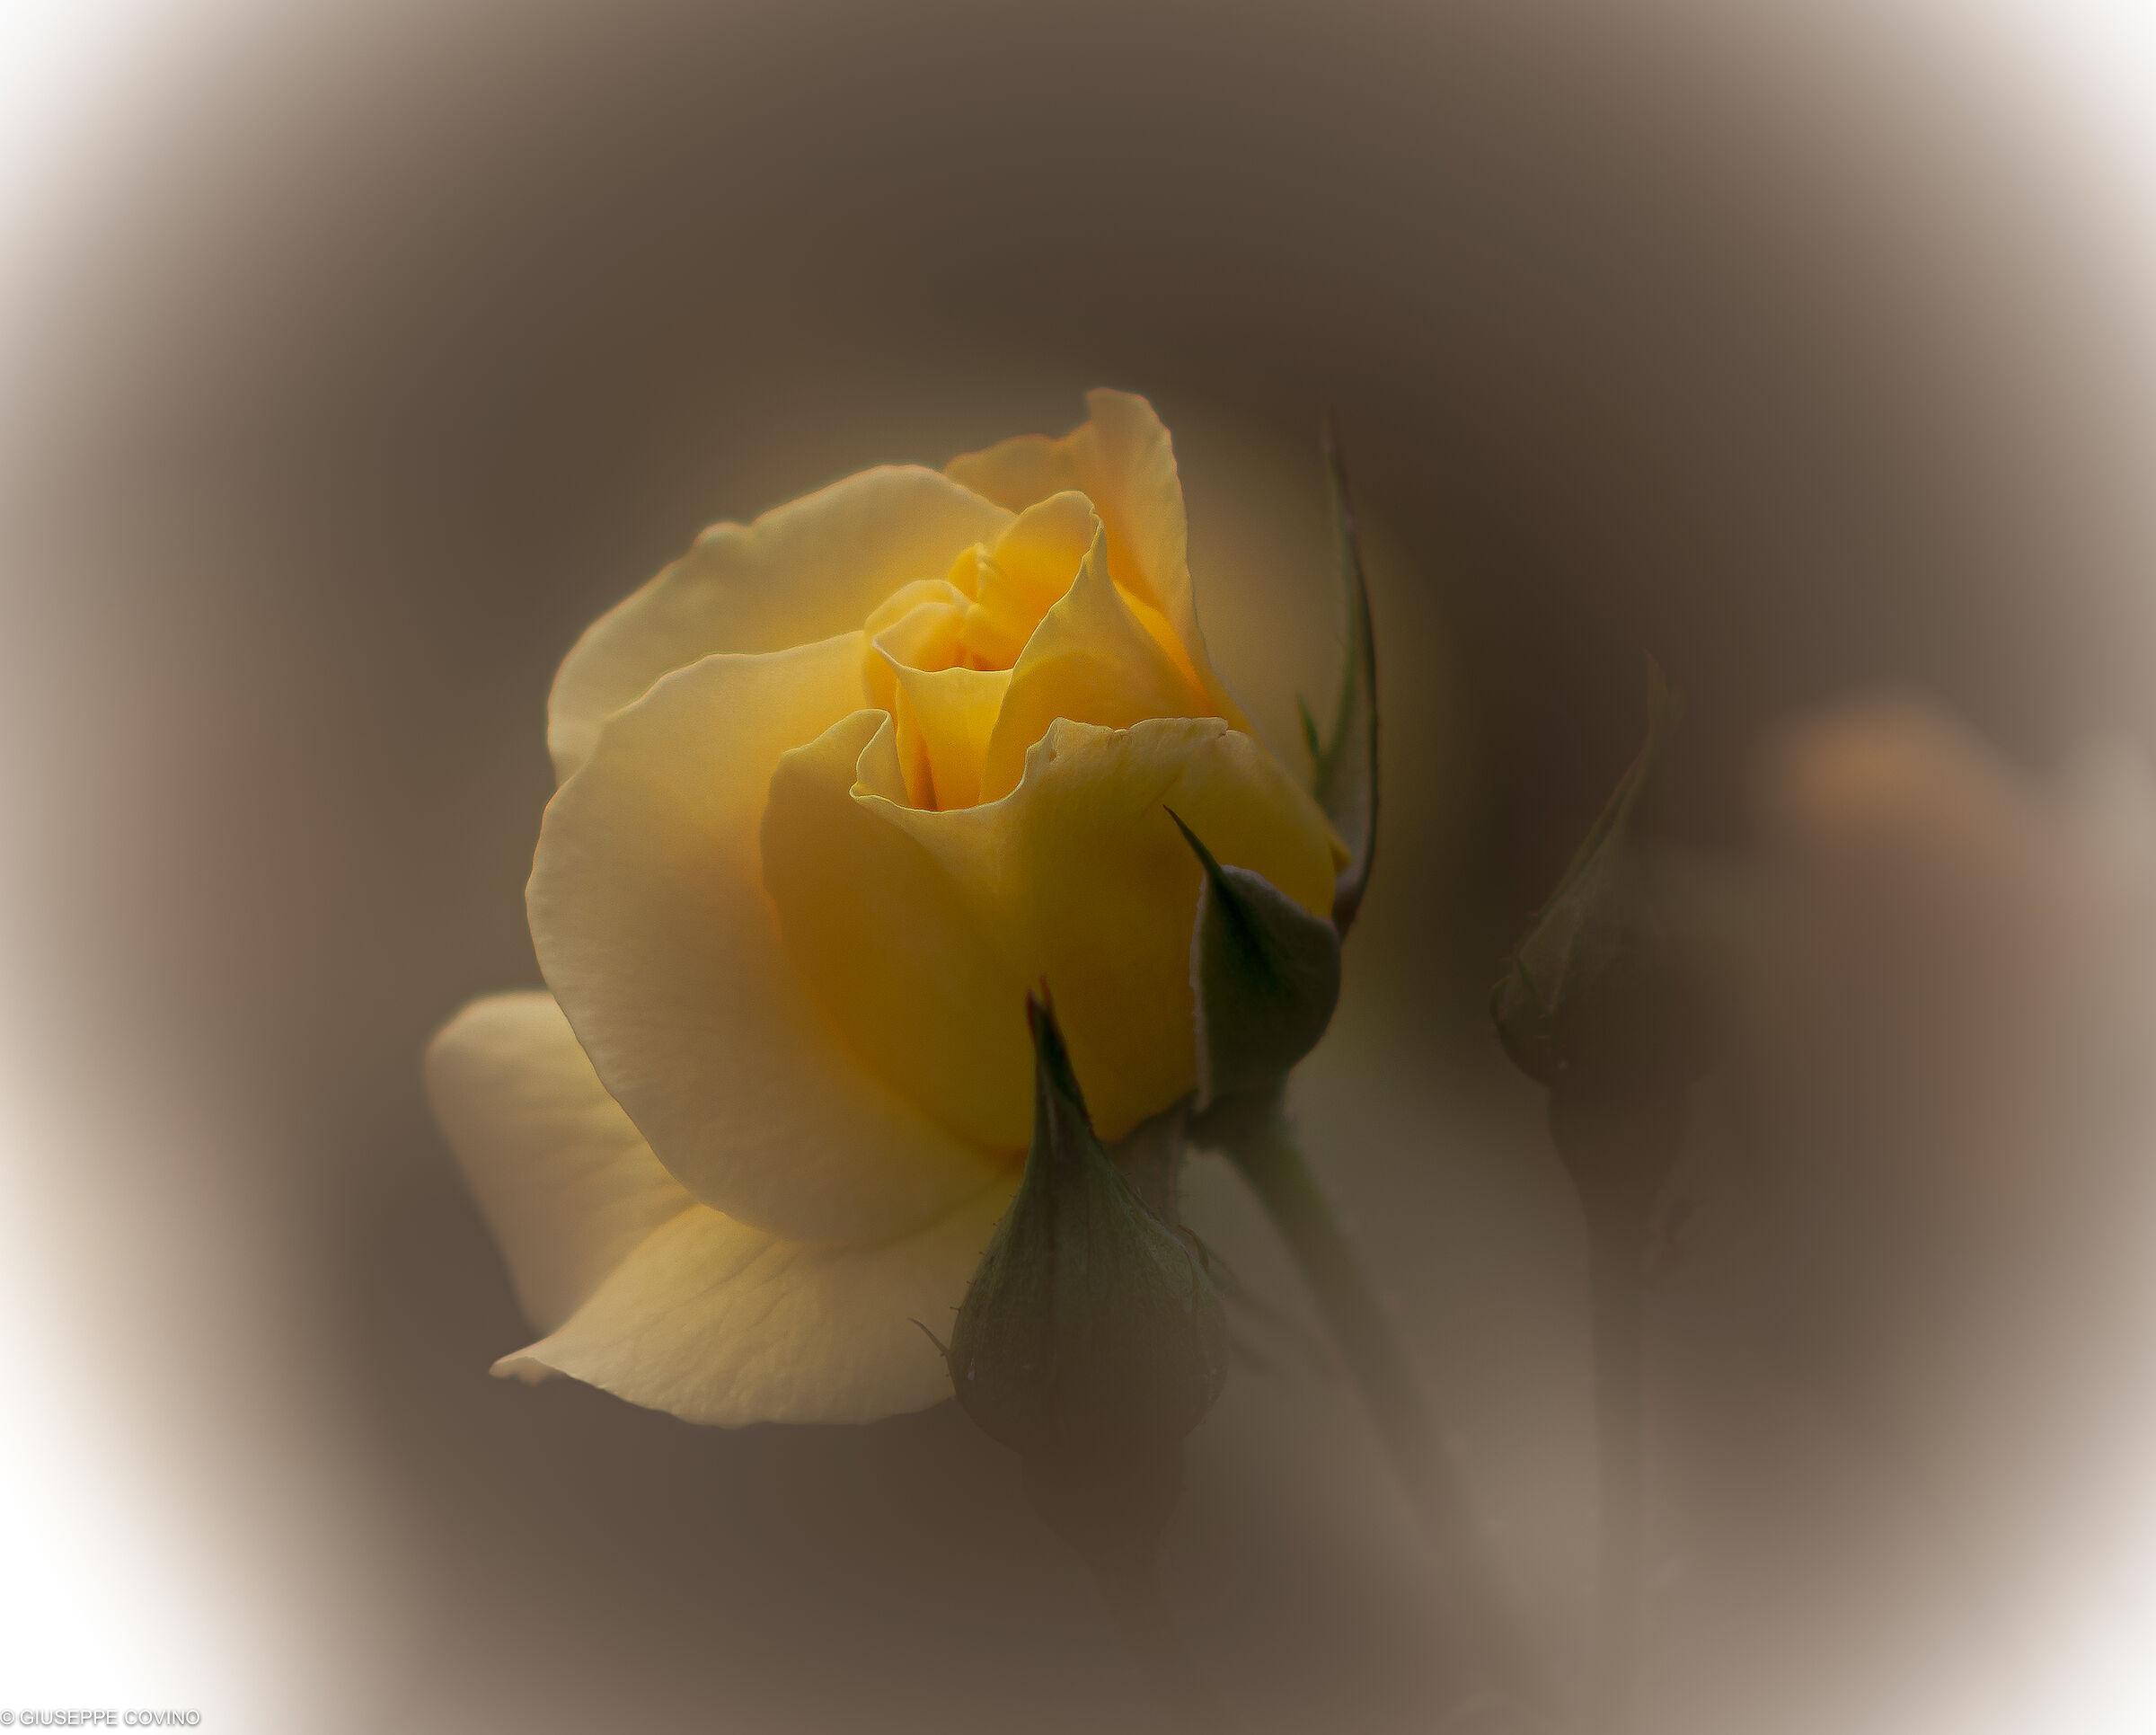 Yellow rose processing...